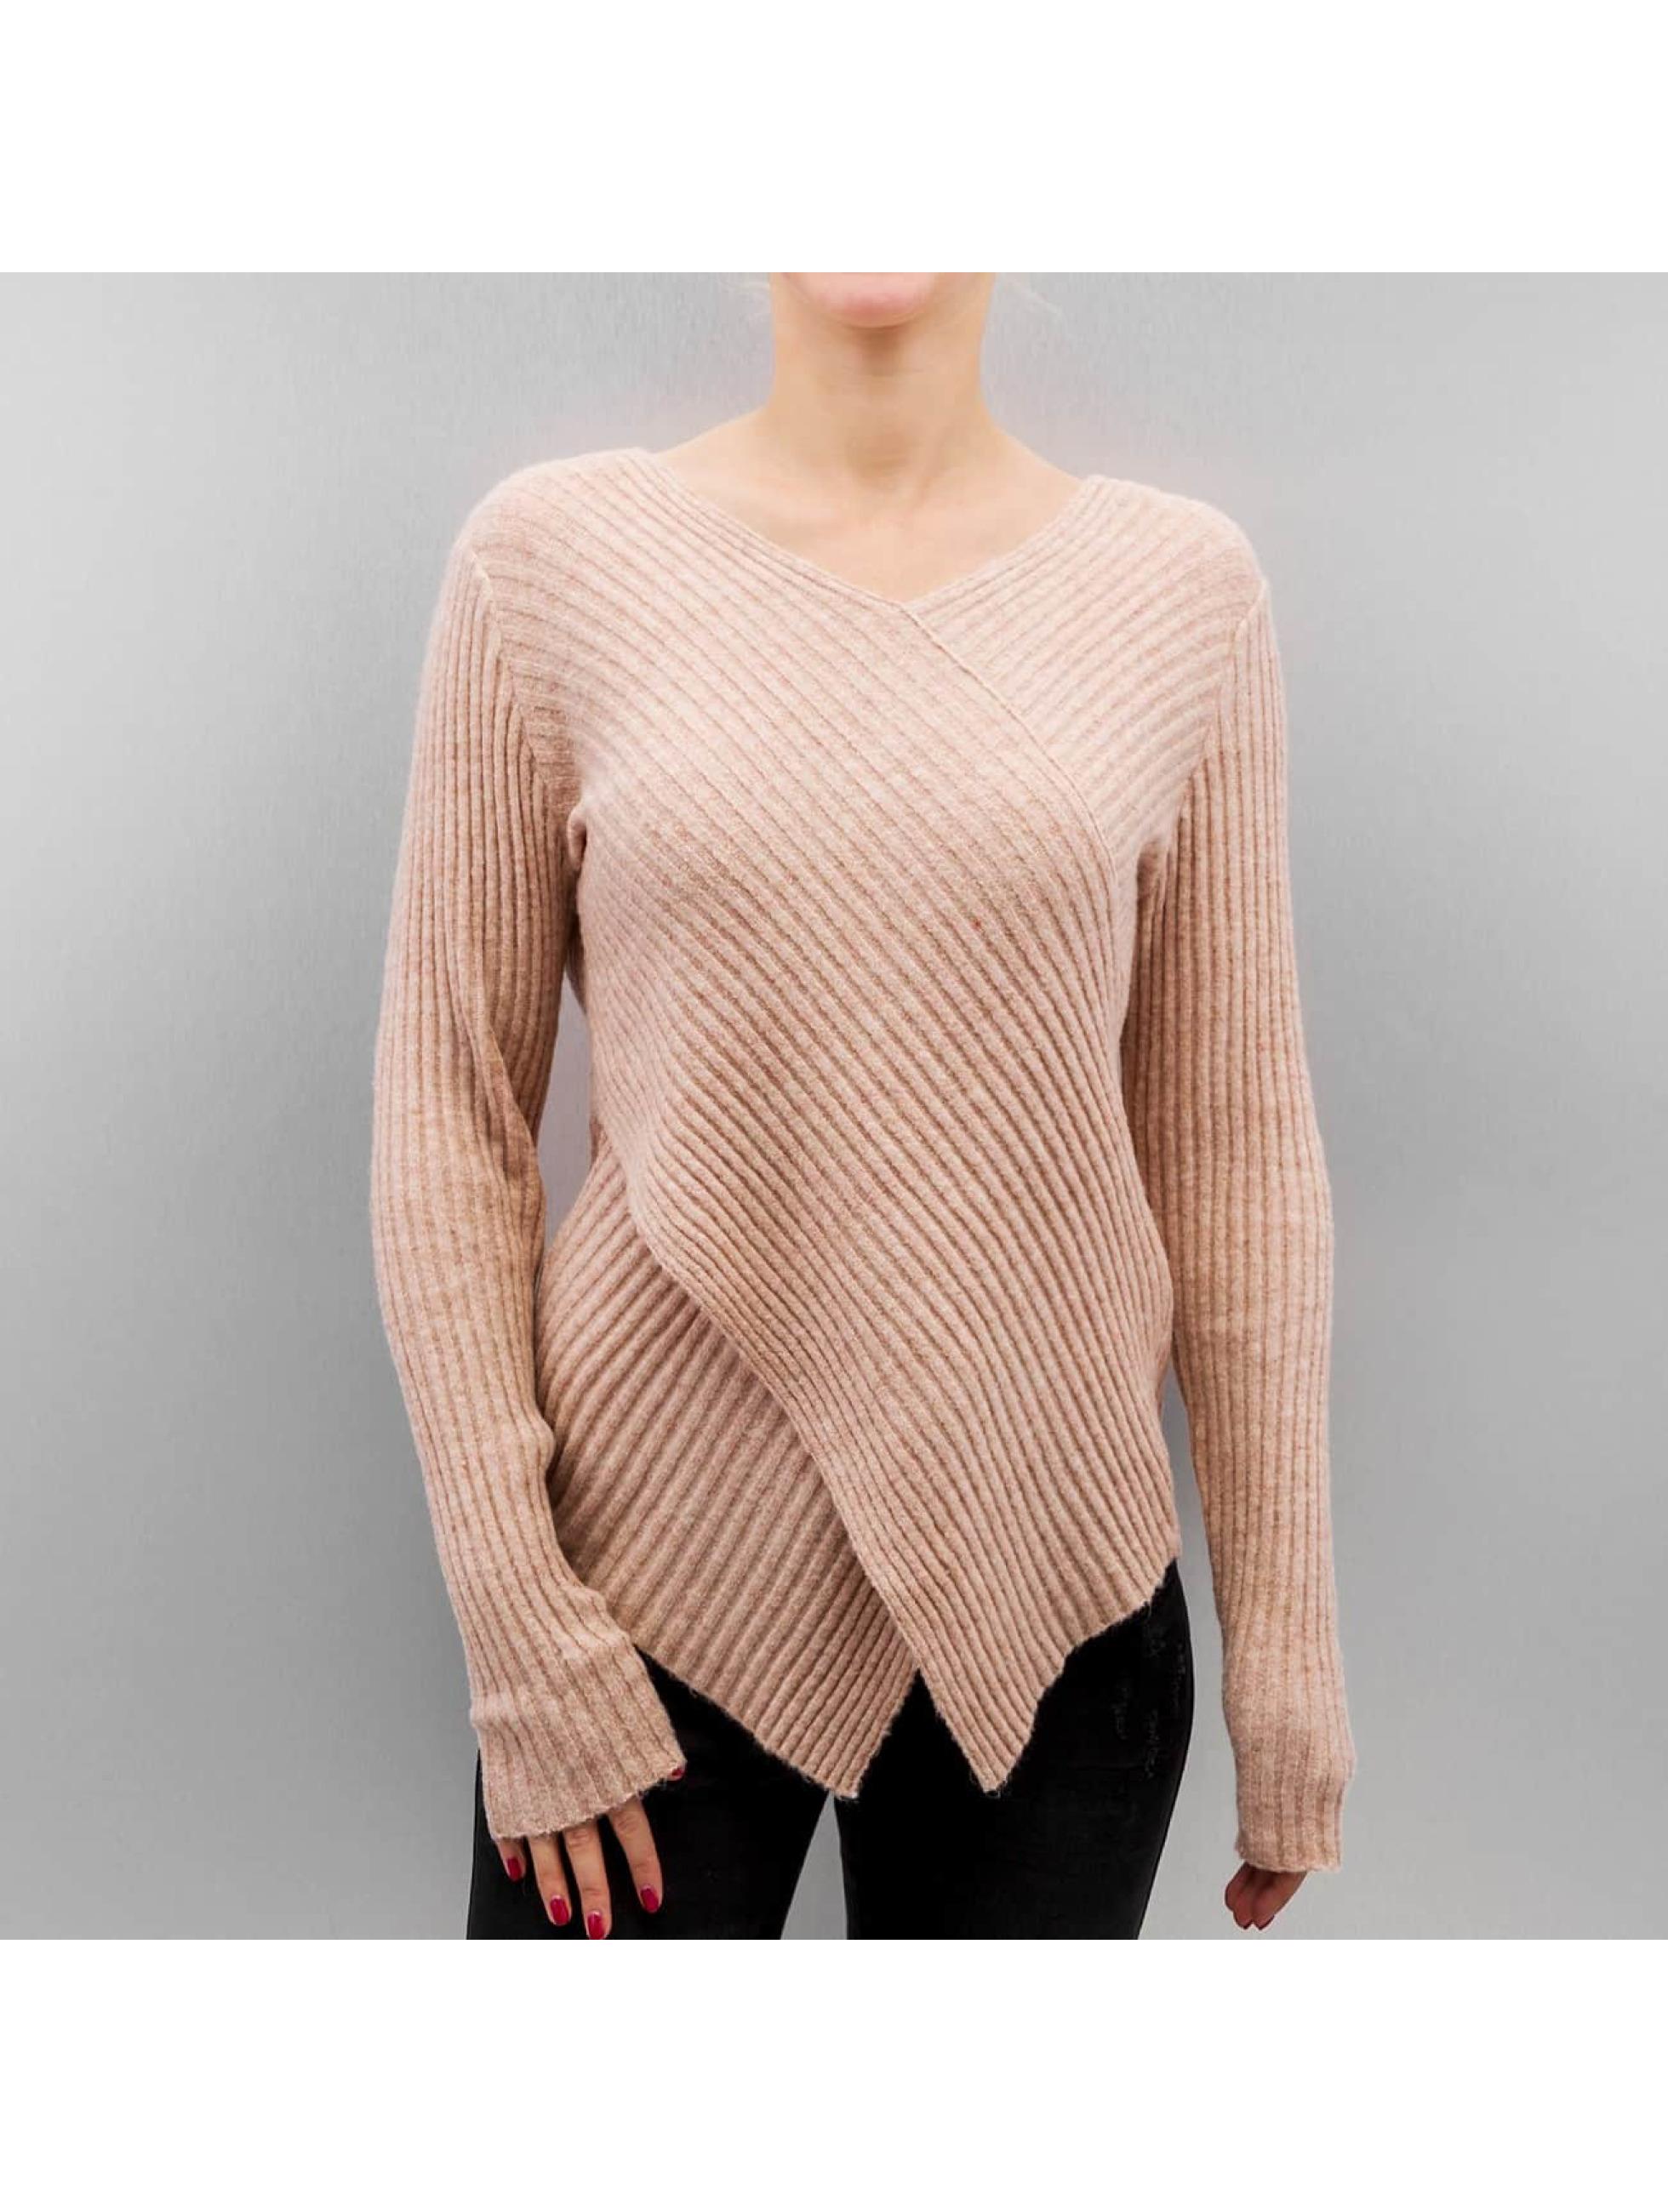 Pullover vmAnny in braun